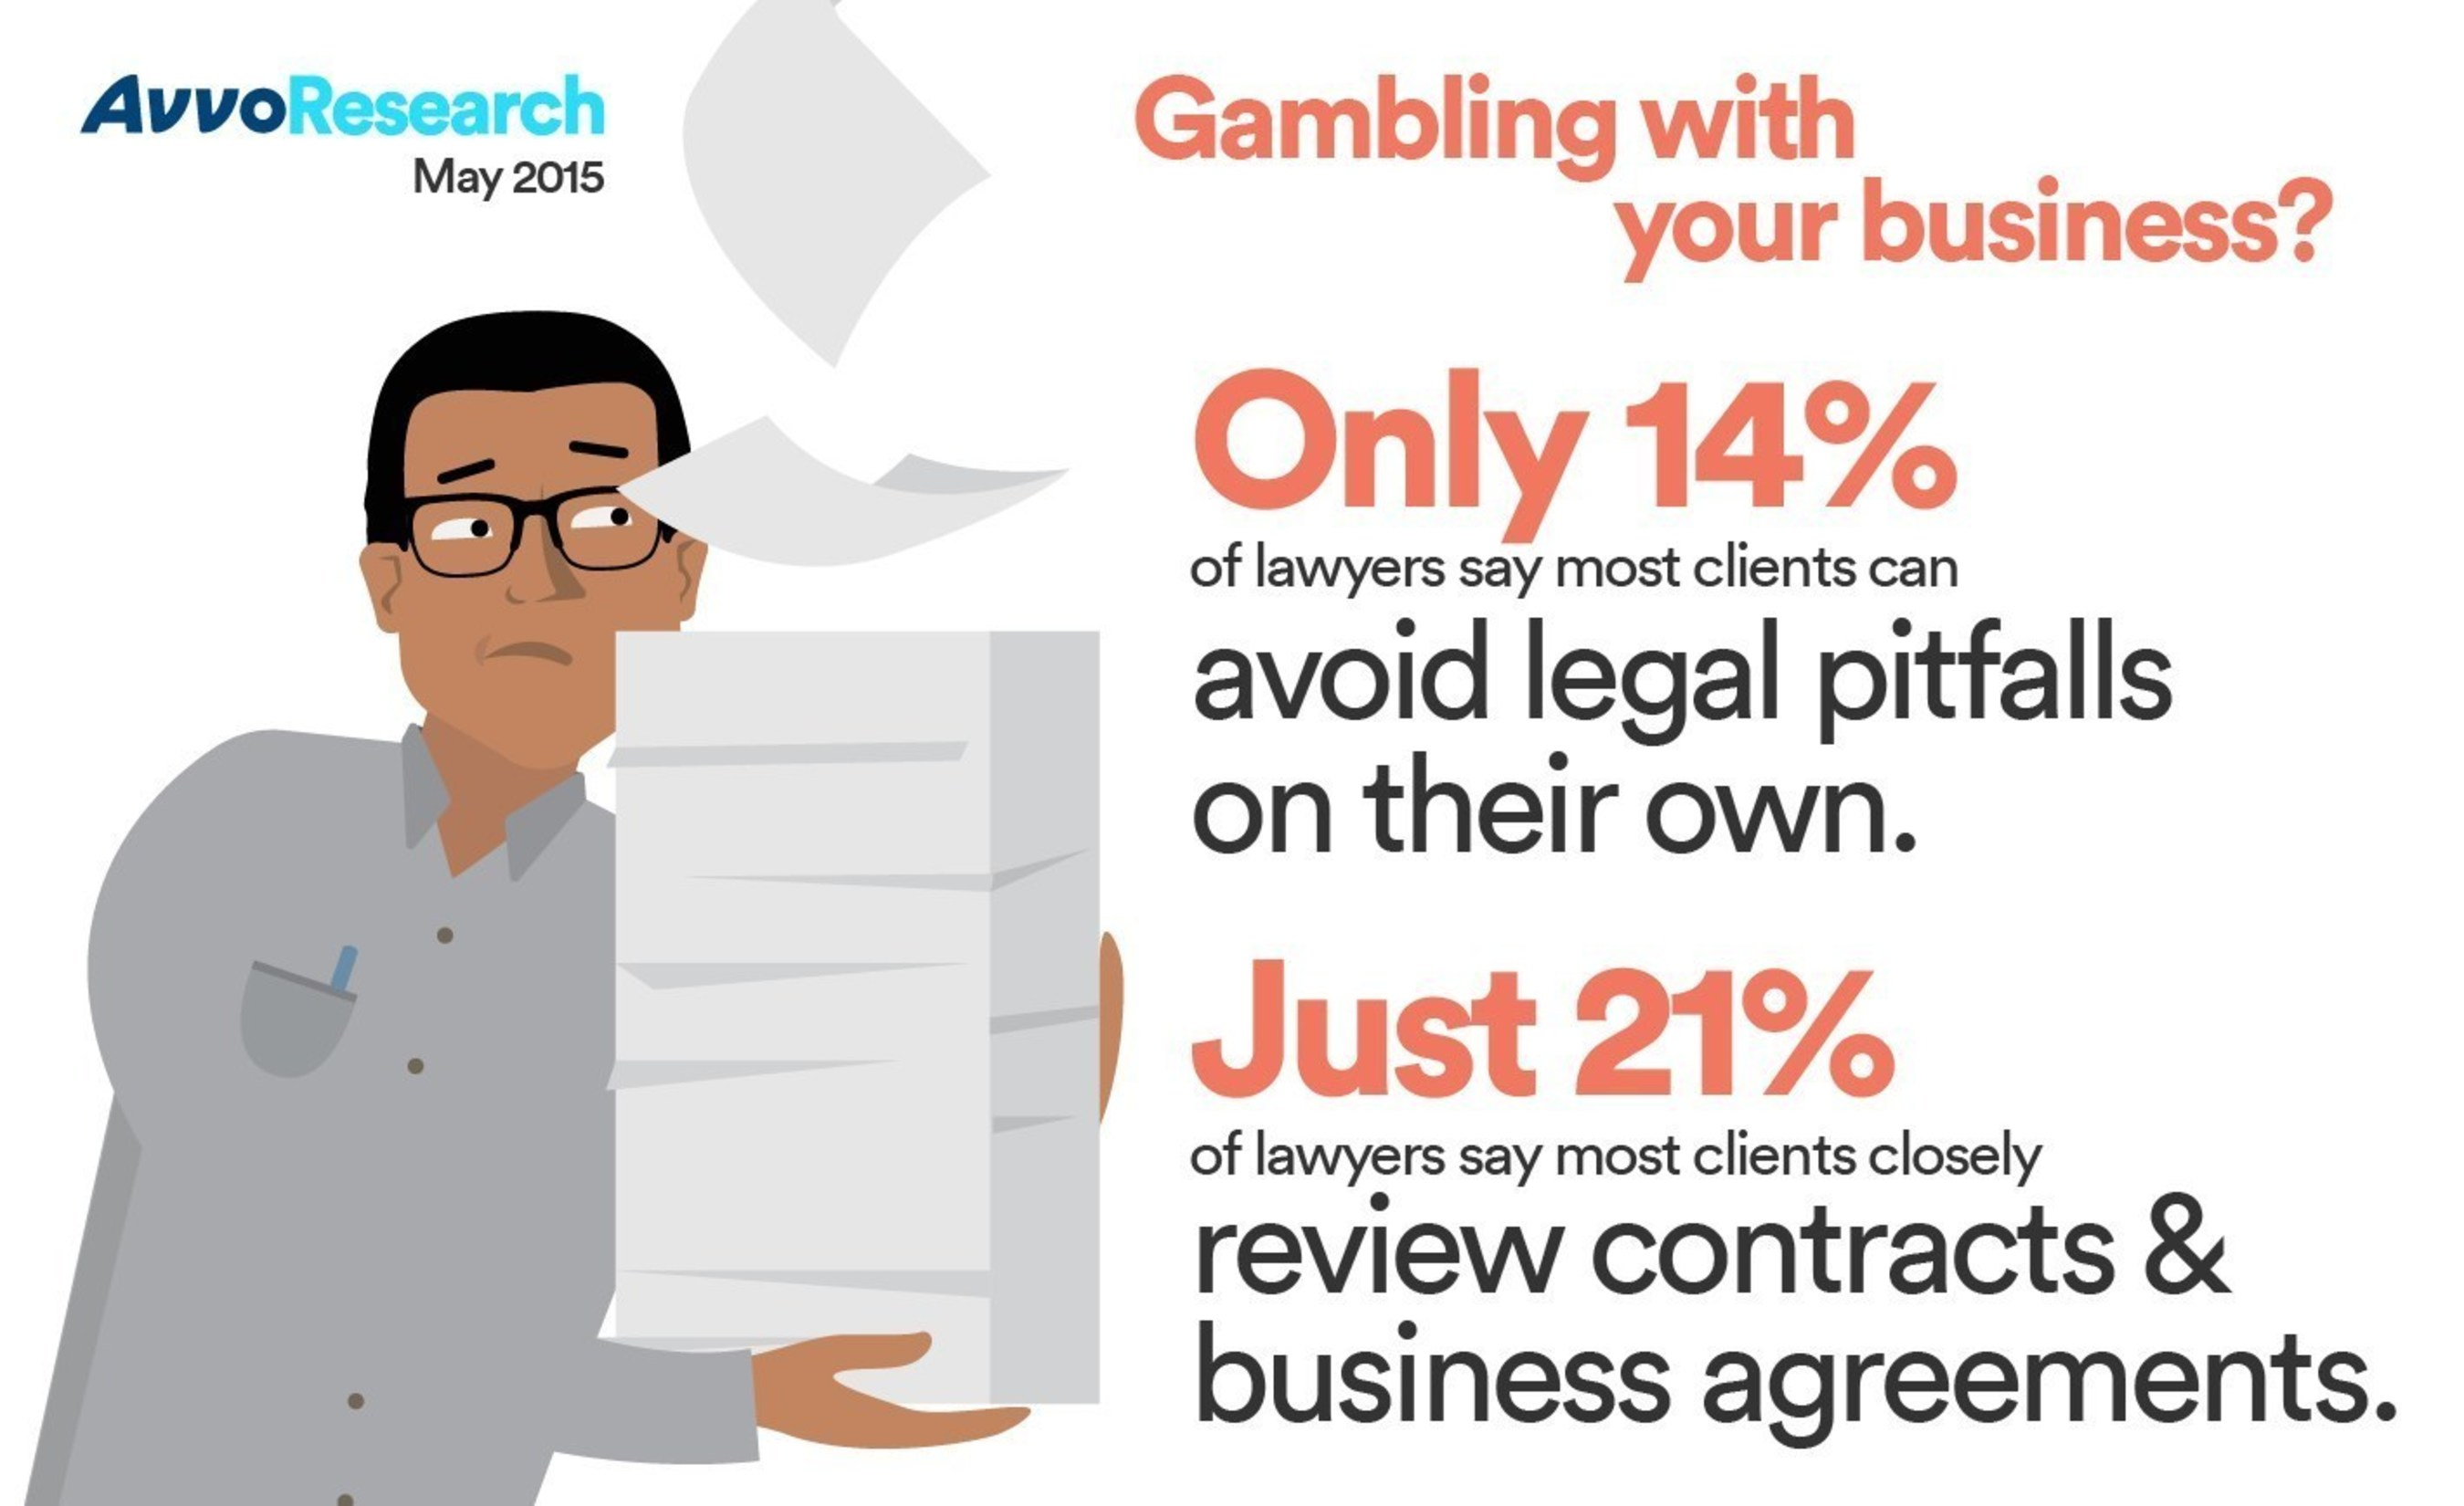 Pitfalls of legal advice